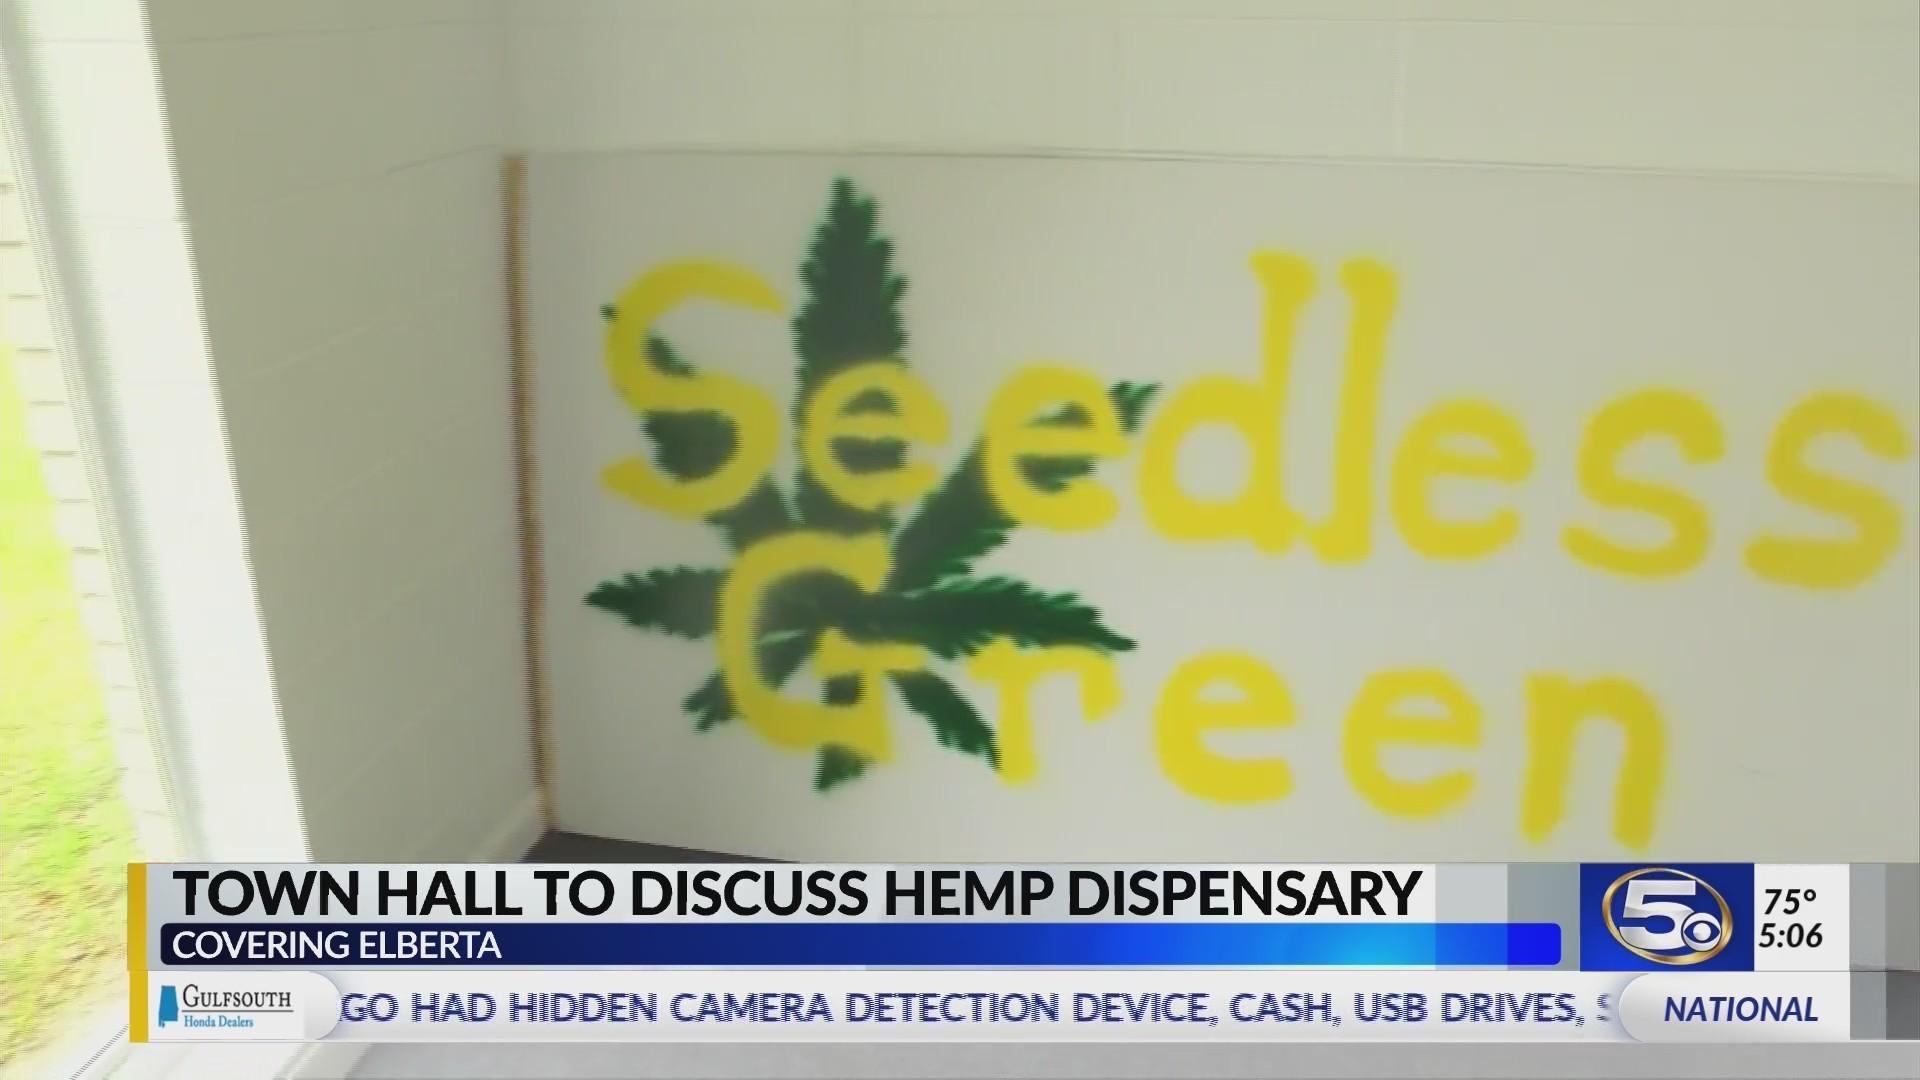 VIDEO: Elberta hemp meeting